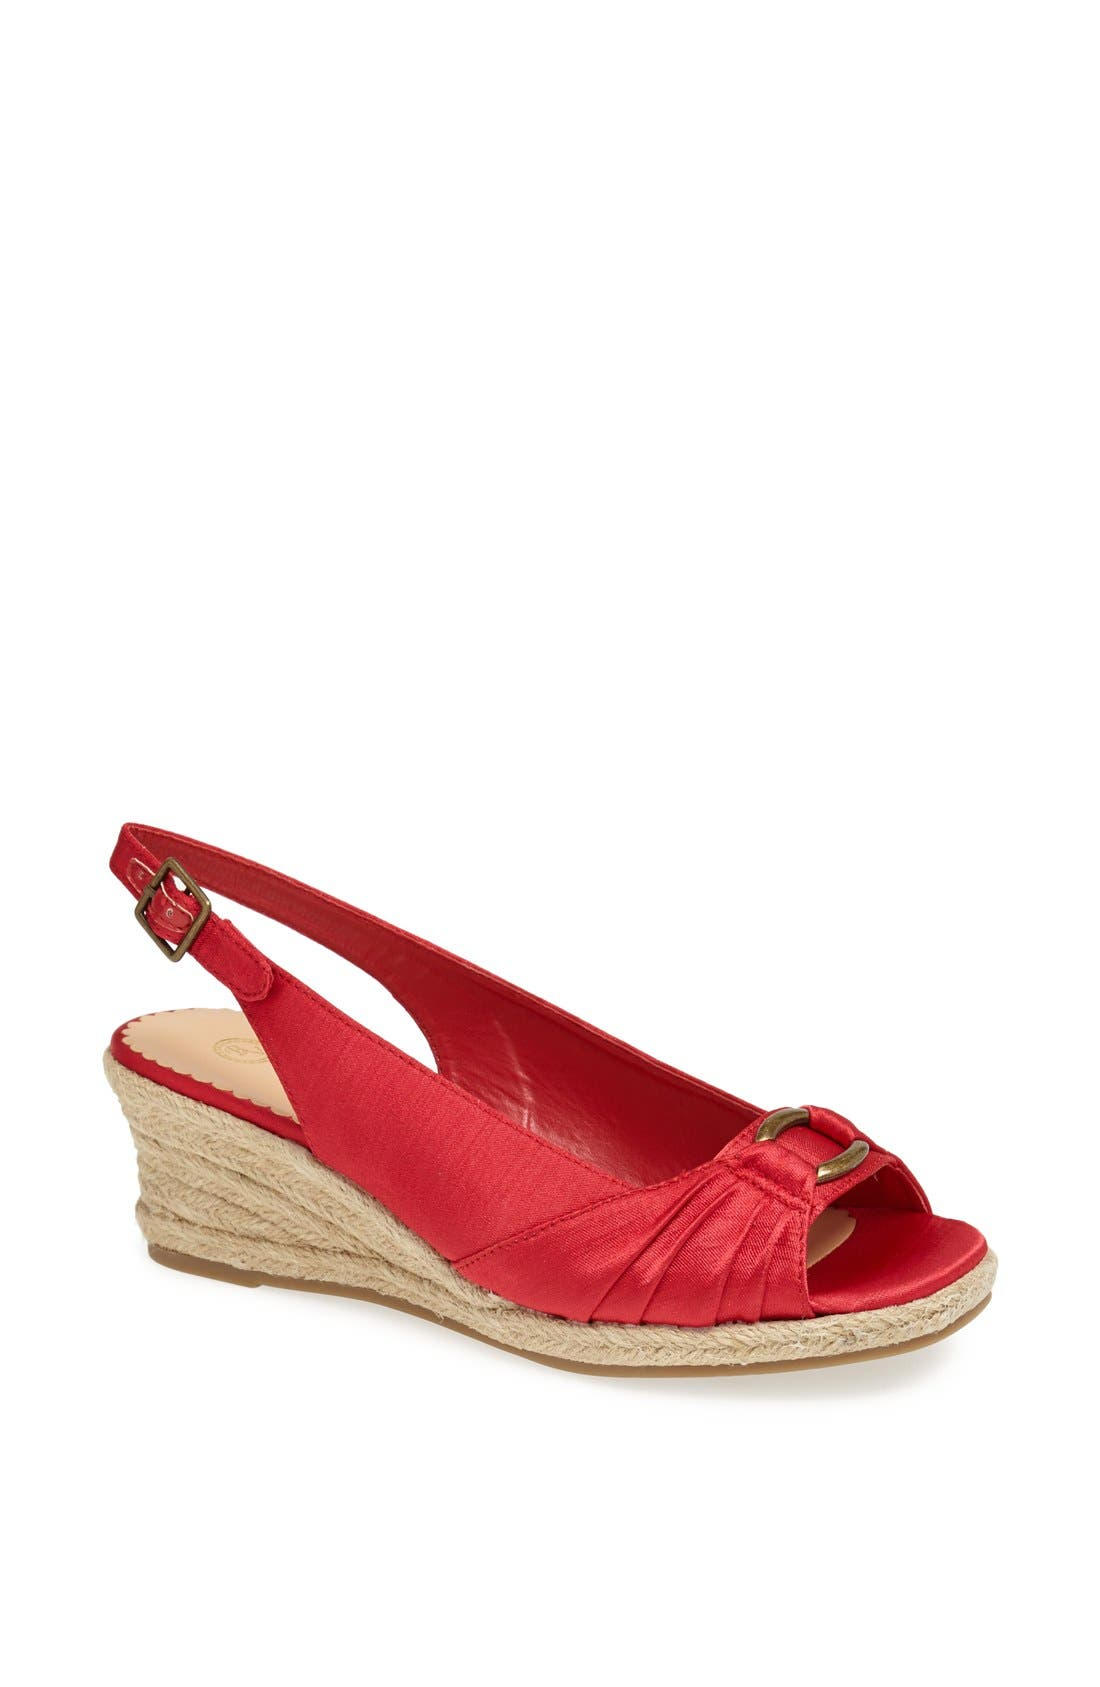 Alternate Image 1 Selected - Bella Vita 'Sharon' Sandal